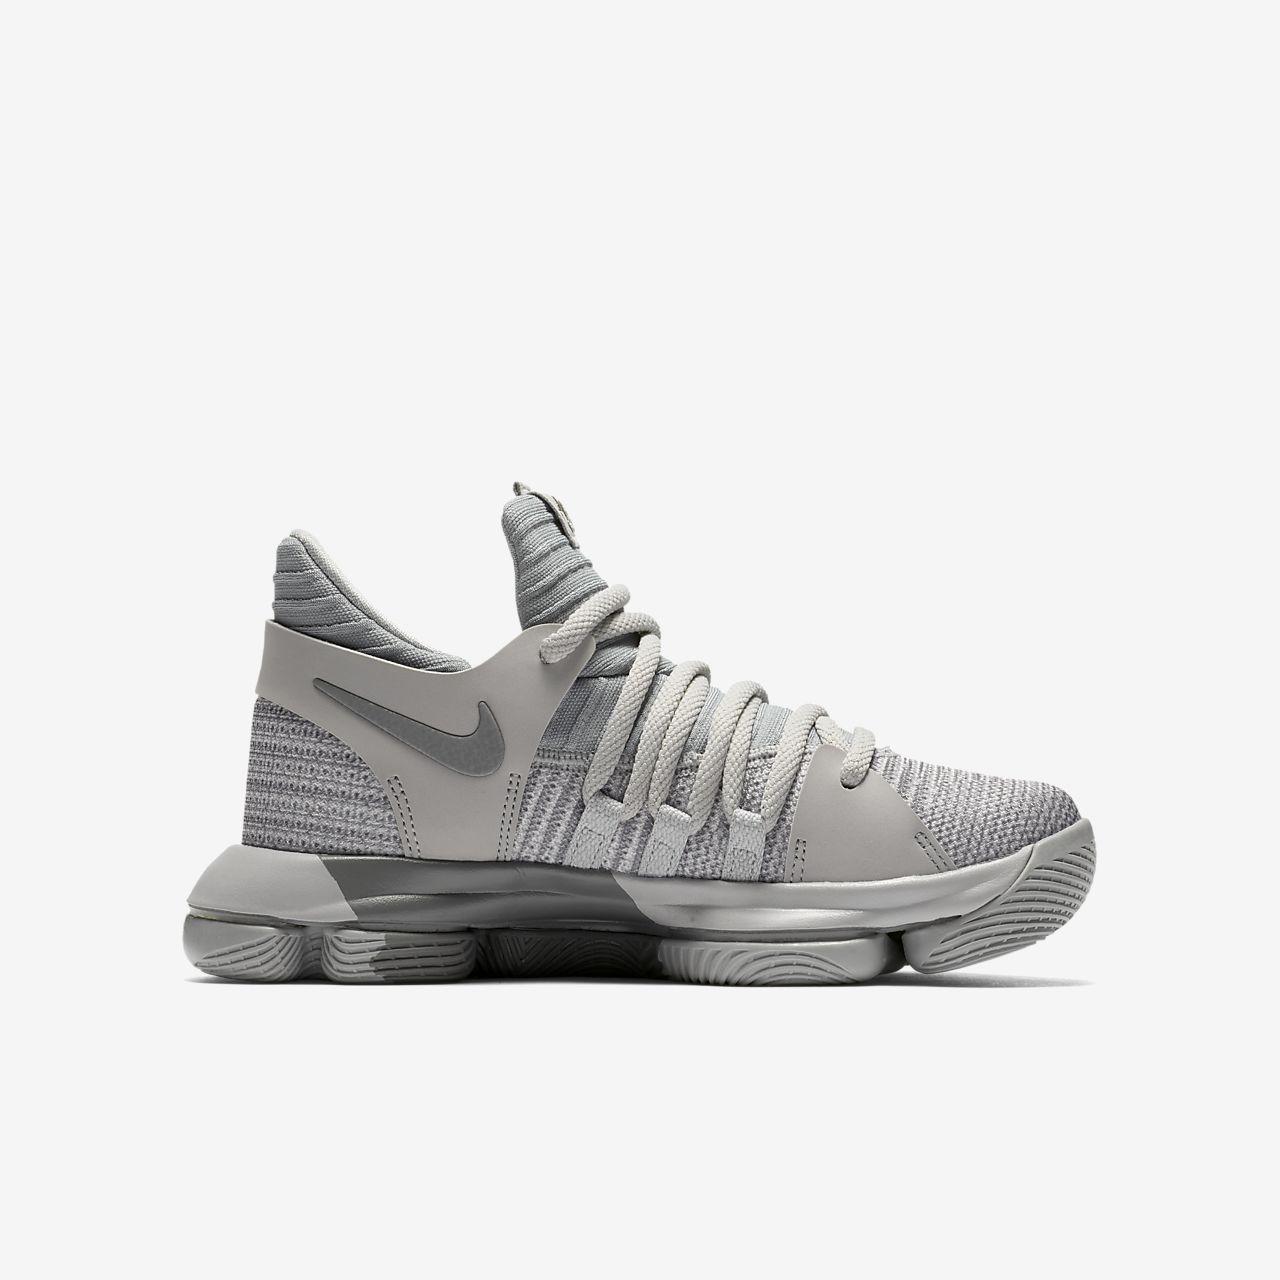 Nike Free 5.0 (3.5y-7y) Kids' Running Shoe - Dark Grey/Wolf Grey/Cool Grey/Black : U47s7701